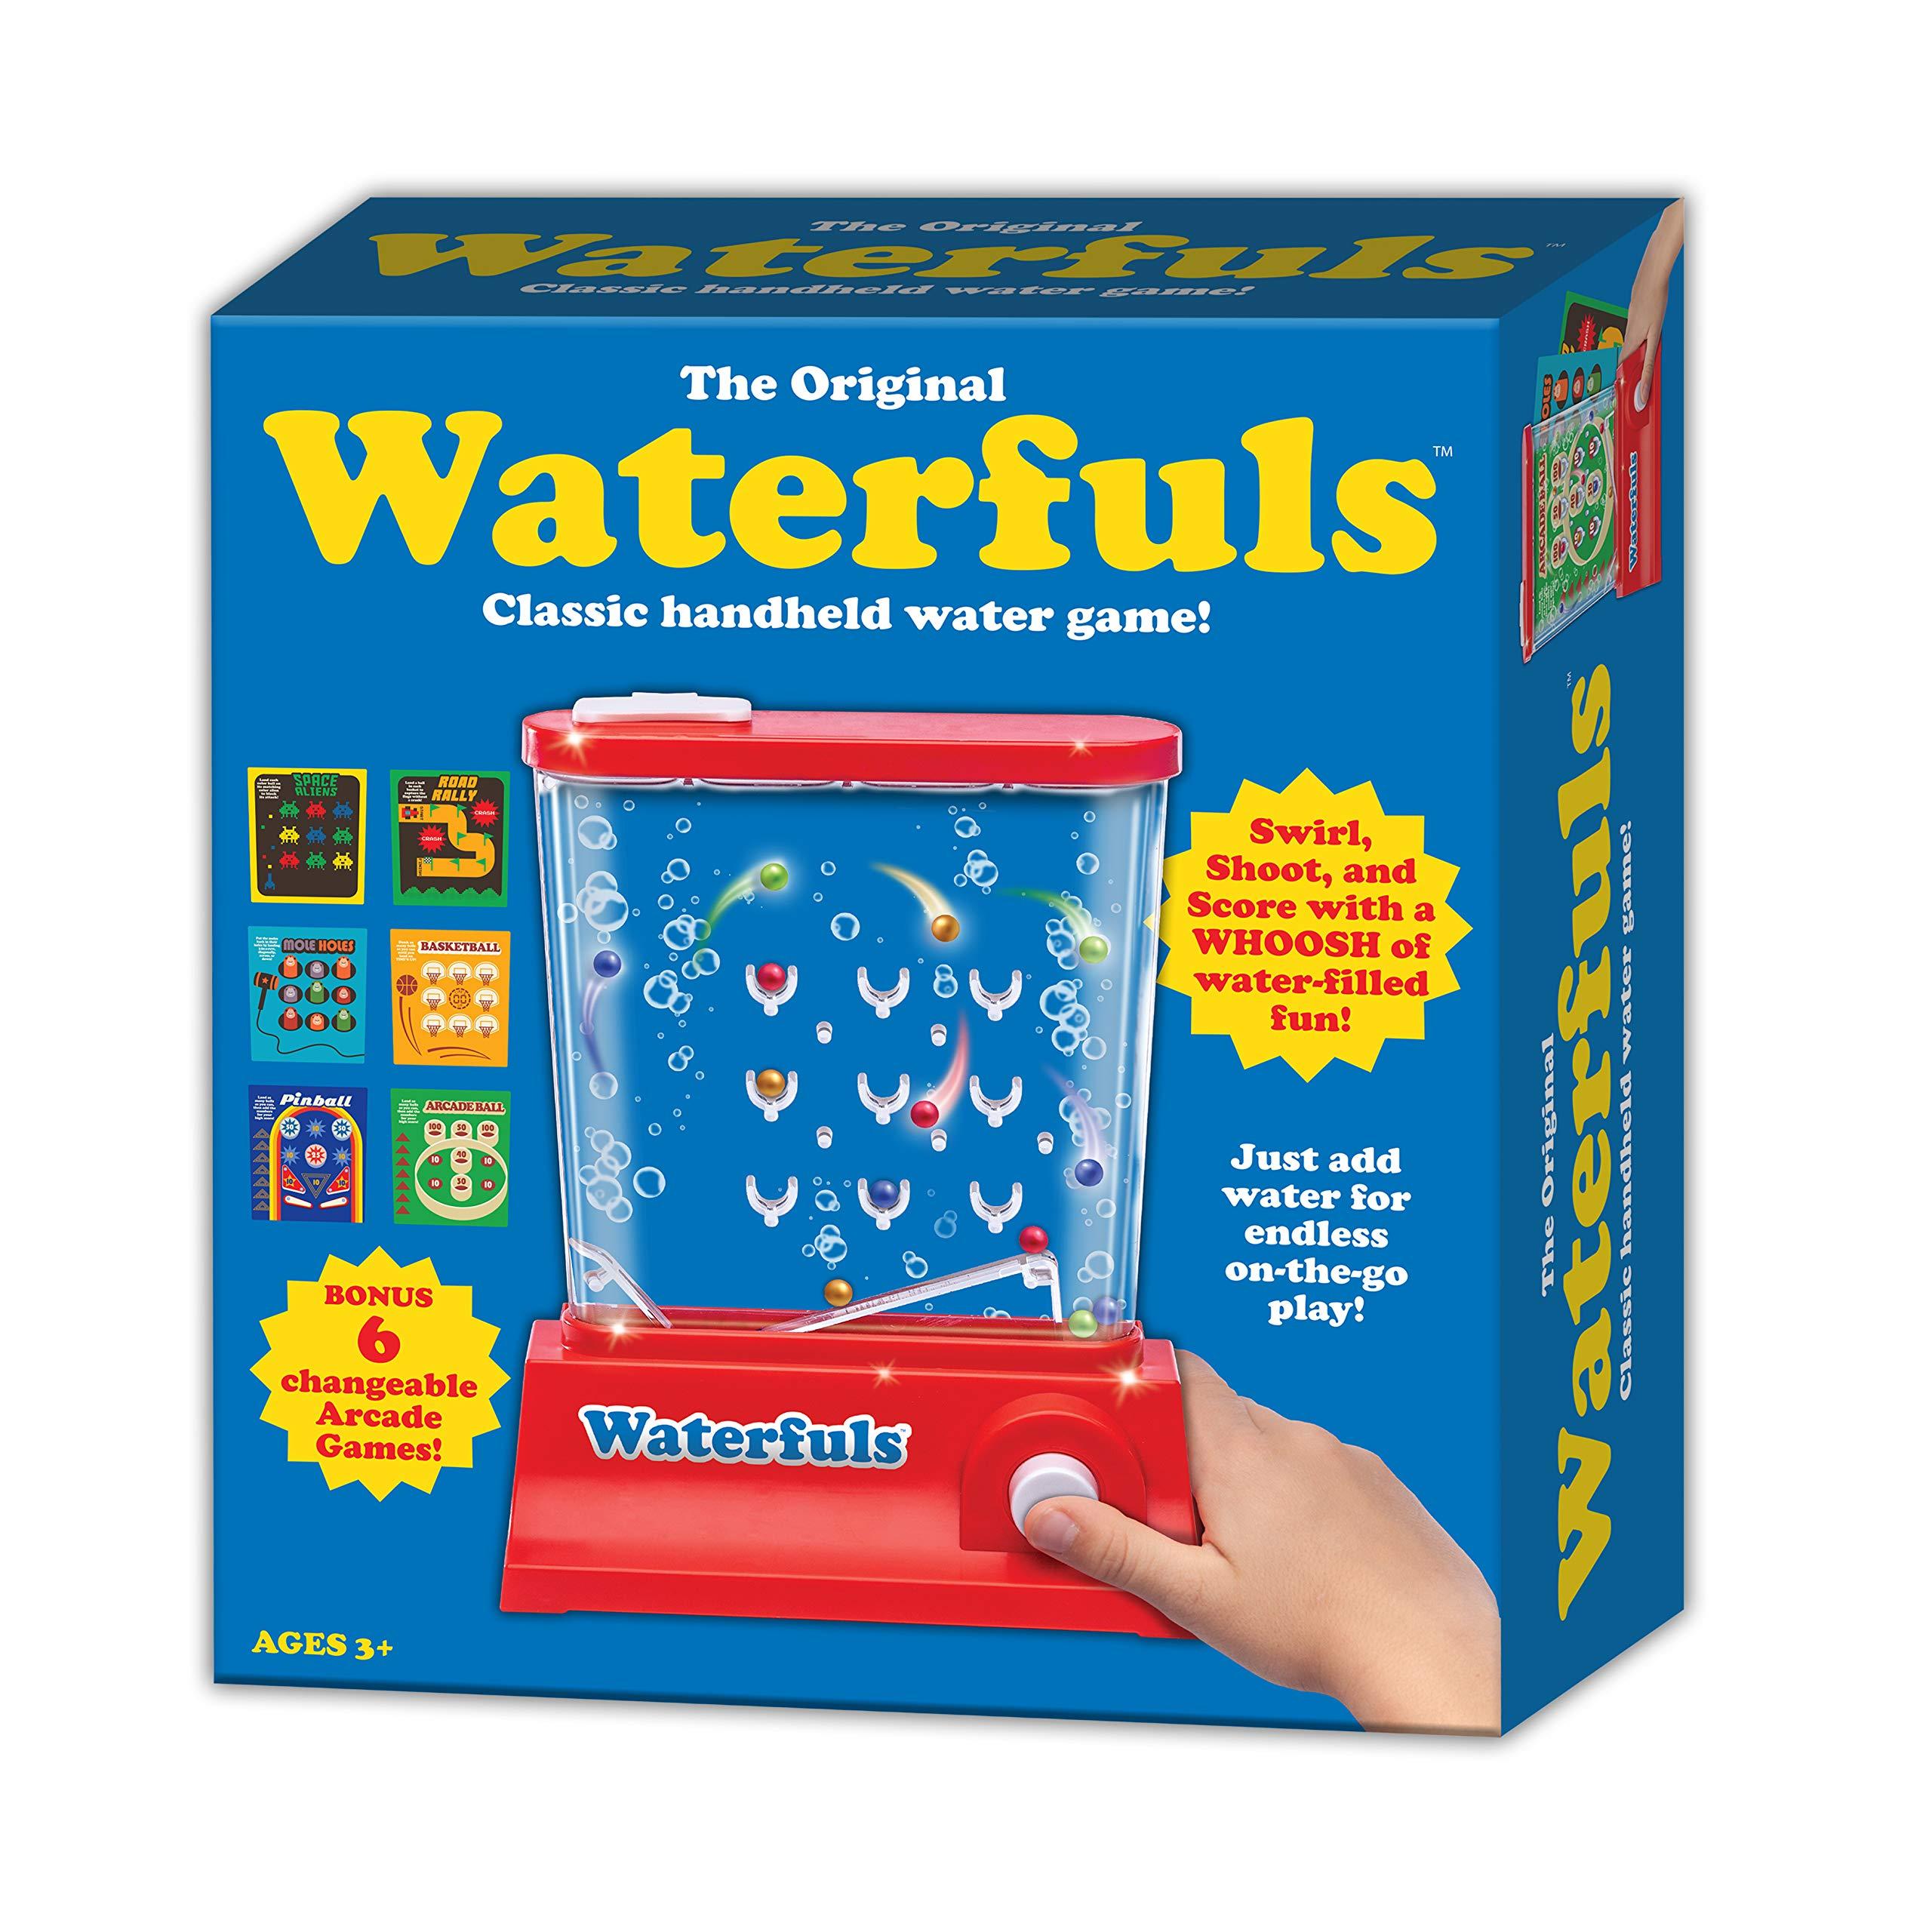 Waterfuls The Original Handheld Game by Waterfuls